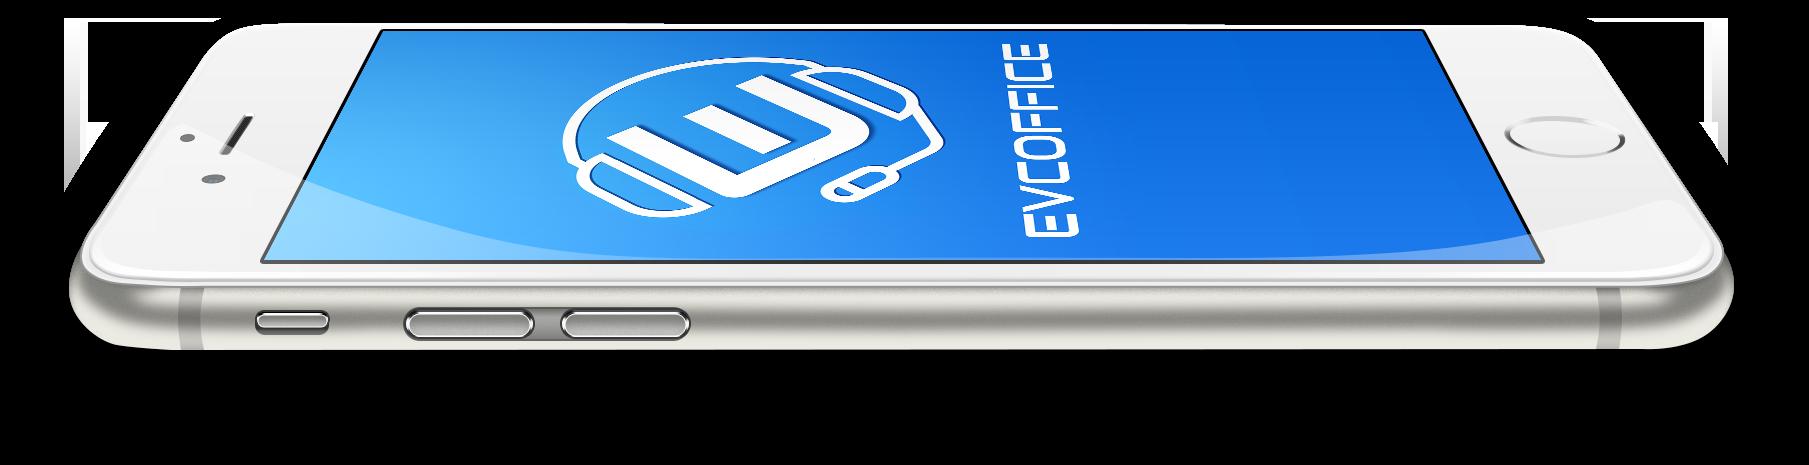 evcoffice app on iphone